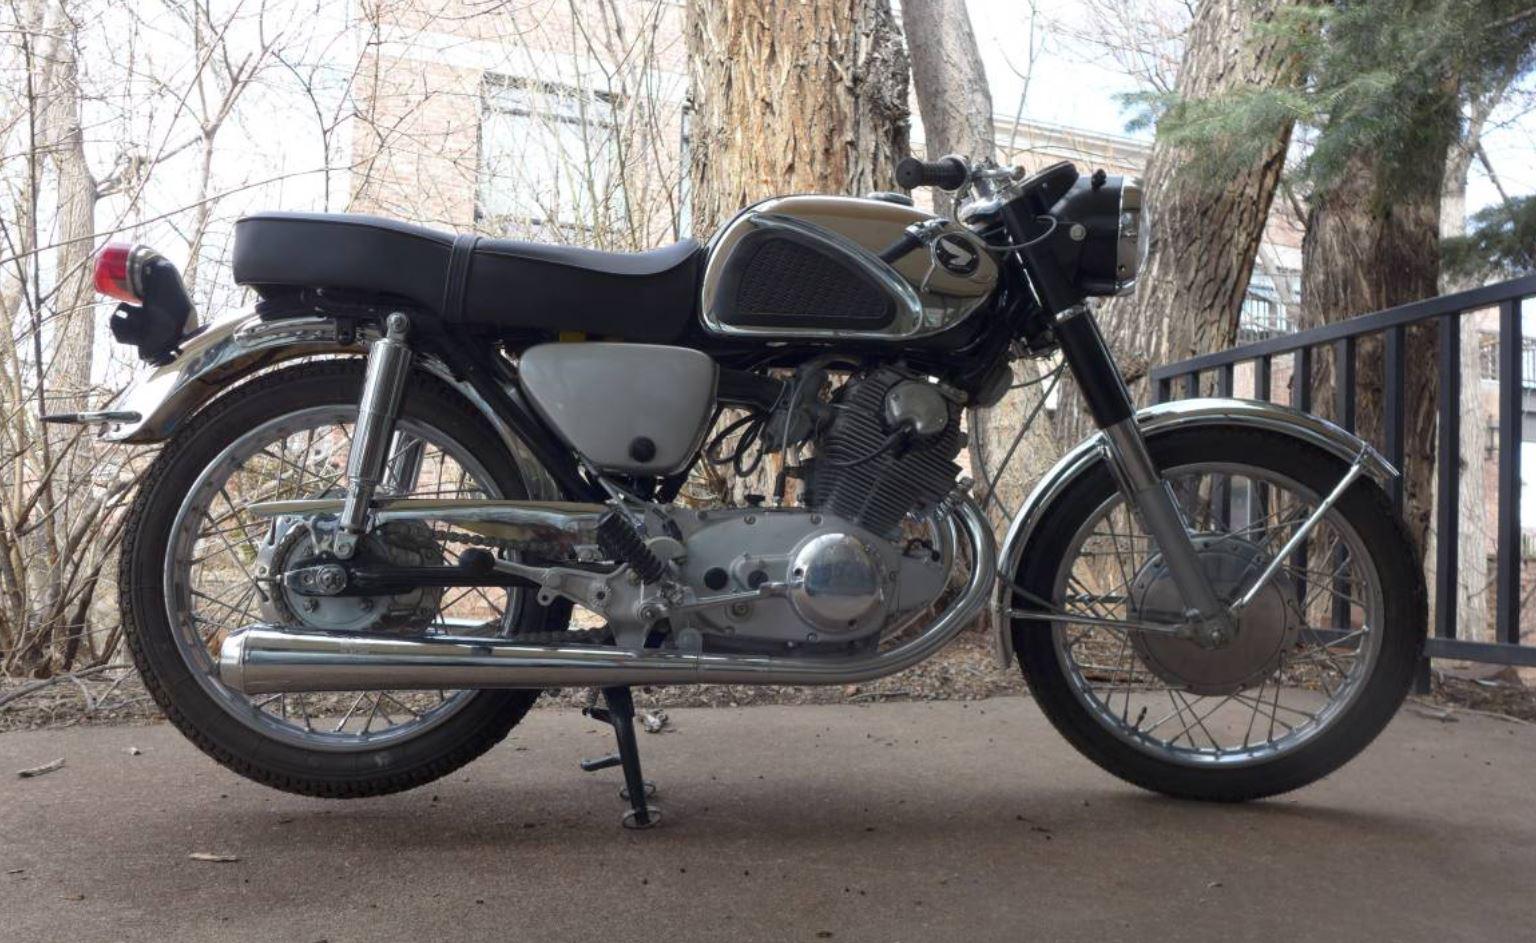 15b9f1d2bd7 Restored – 1967 Honda CB77 Superhawk 305 – Bike-urious